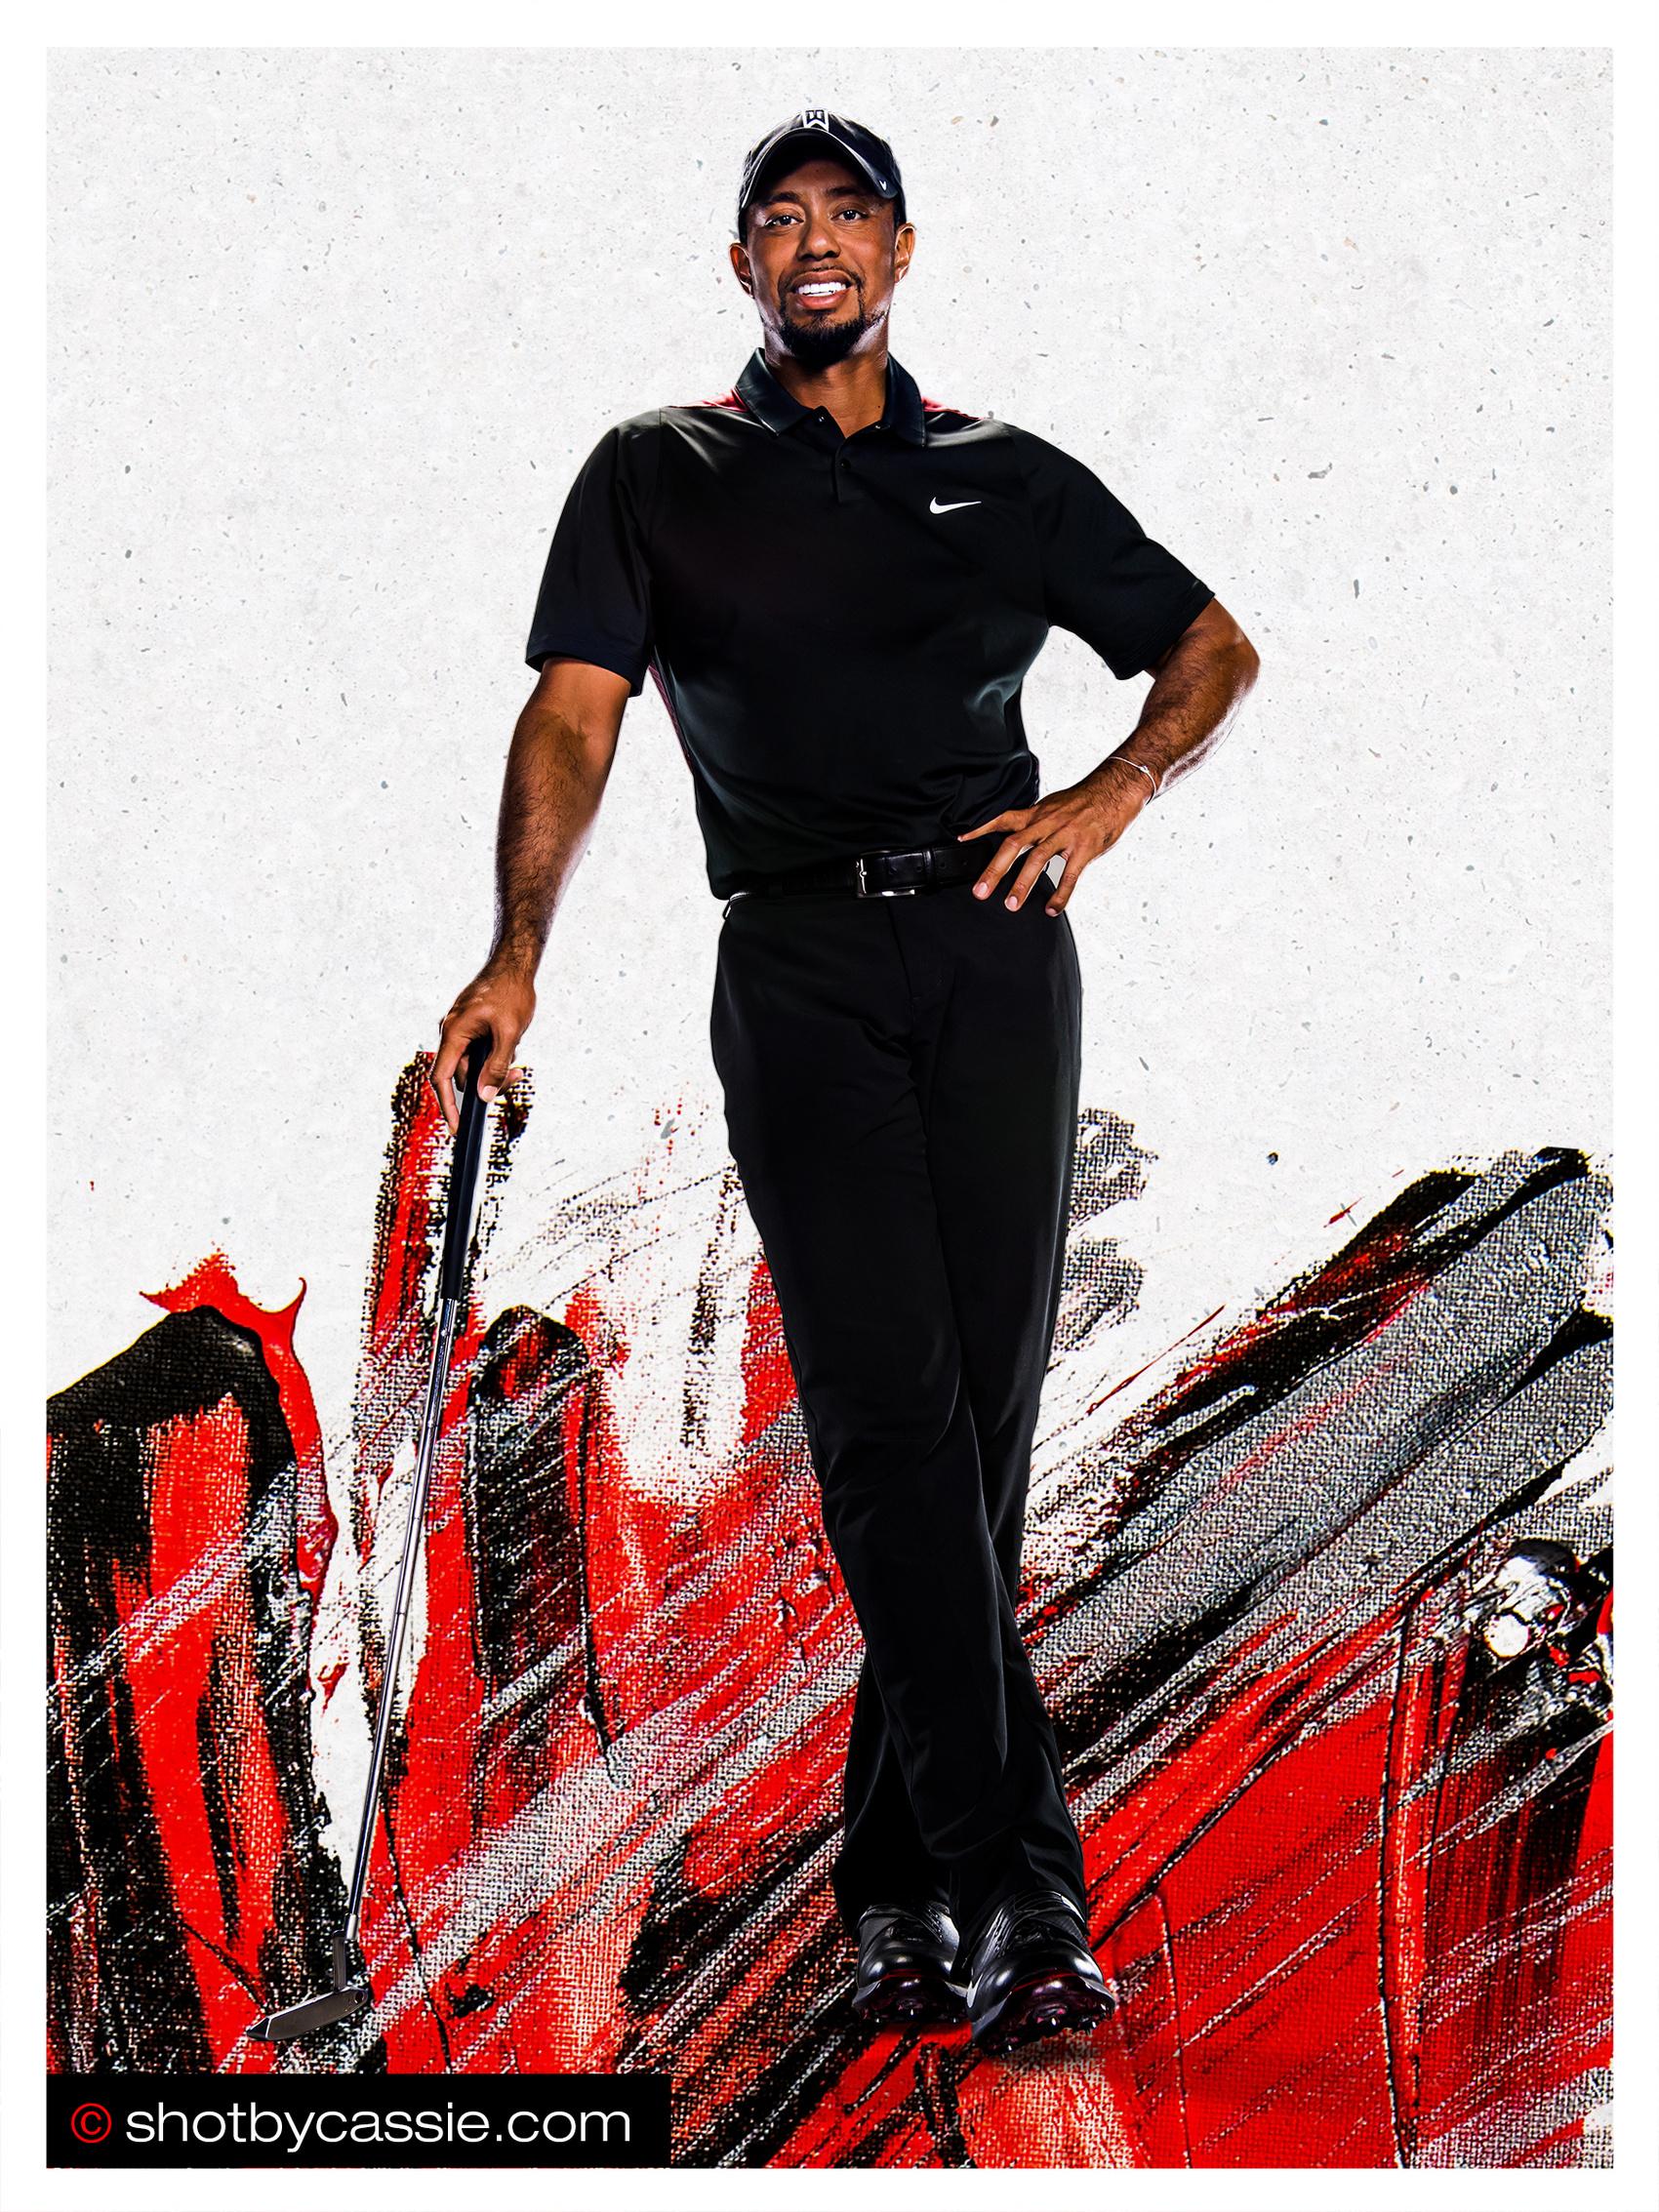 Tiger Woods For Bridgestone Golf